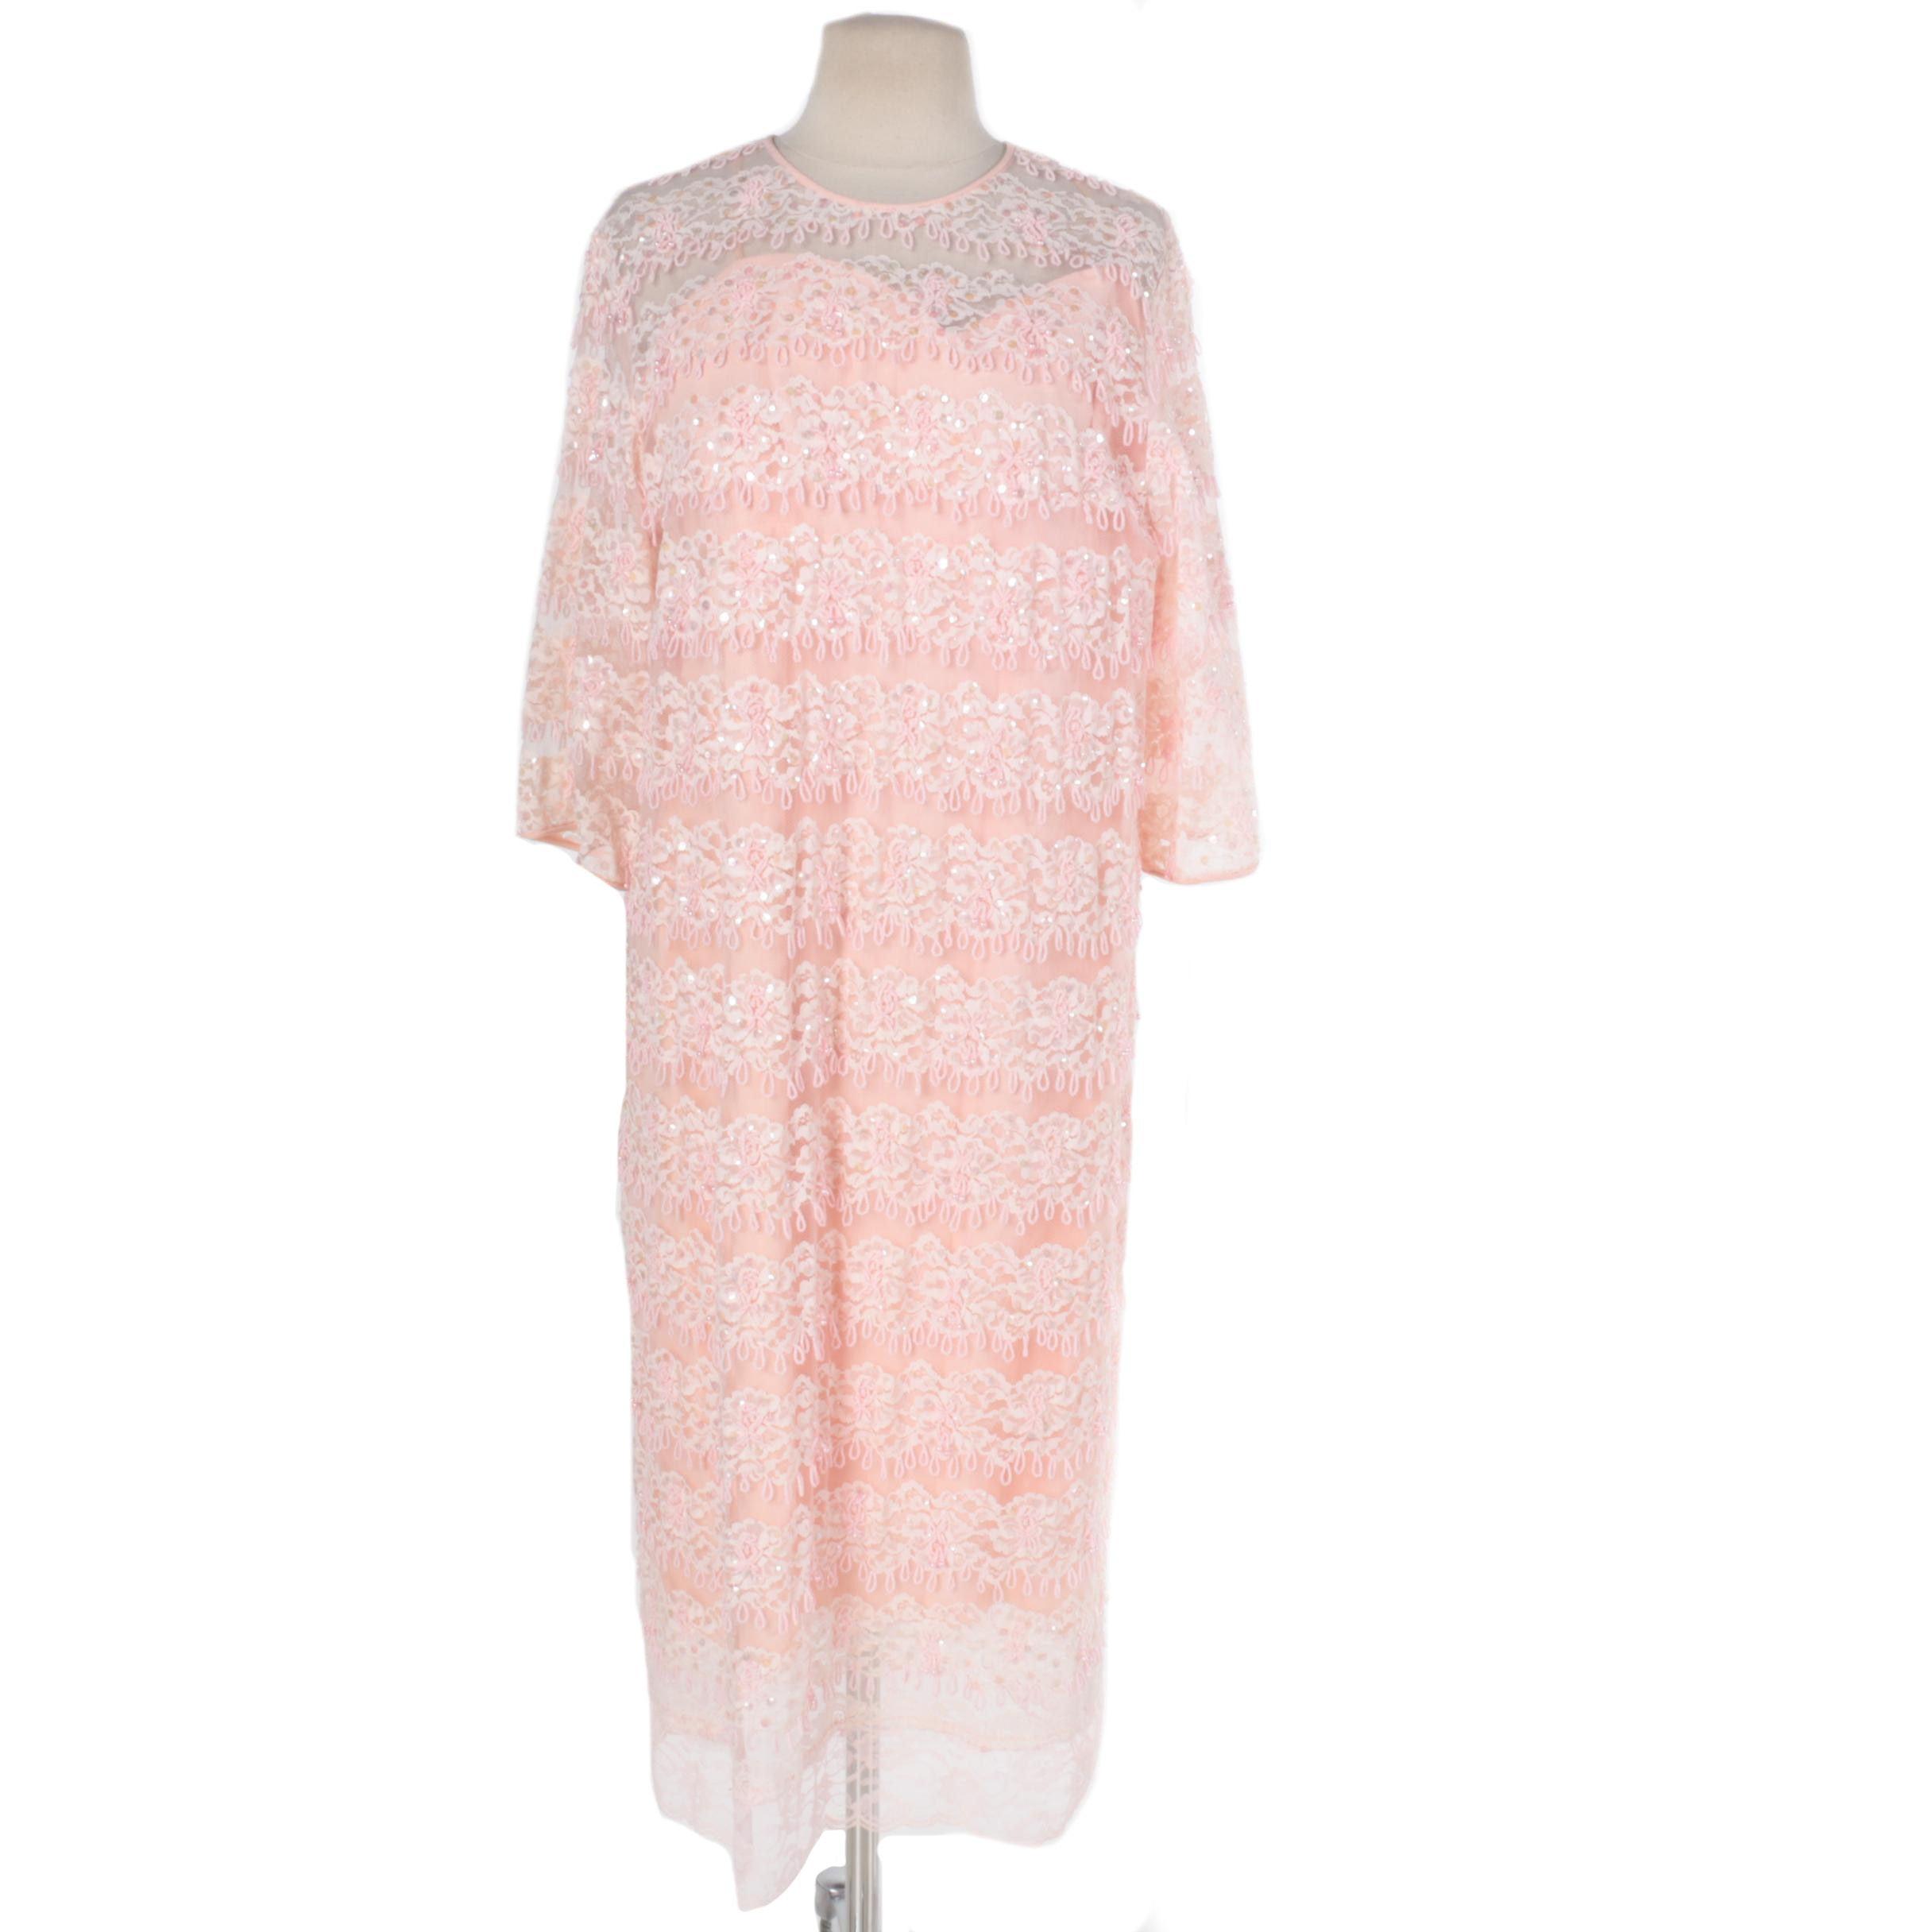 Vintage Miss Elliette Beaded Lace Dress